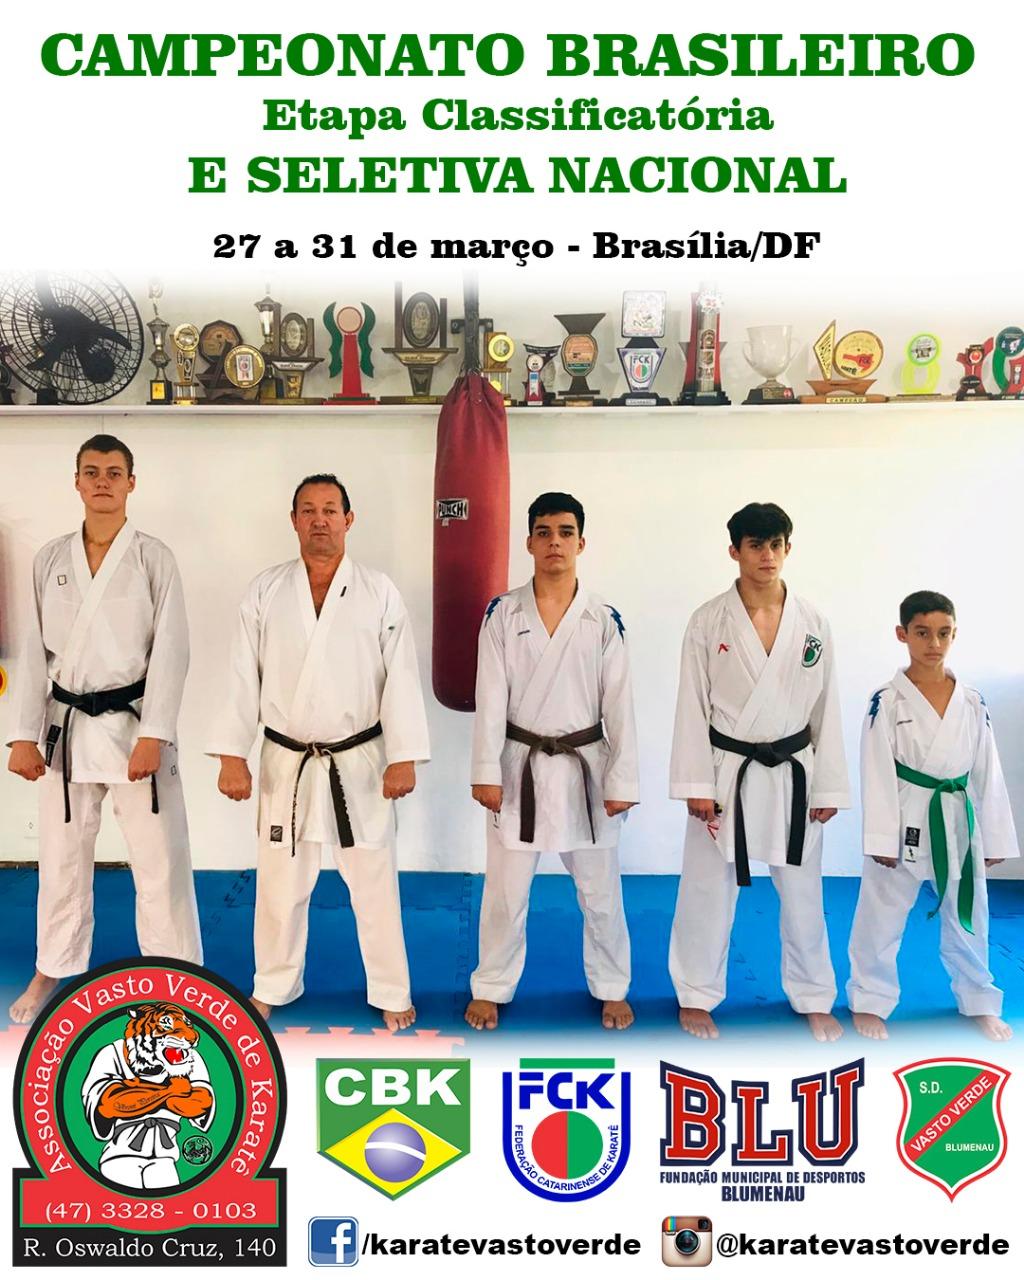 CAMPEONATO BRASILEIRO DE KARATÊ 1ª etapa classificatória - Brasília/DF